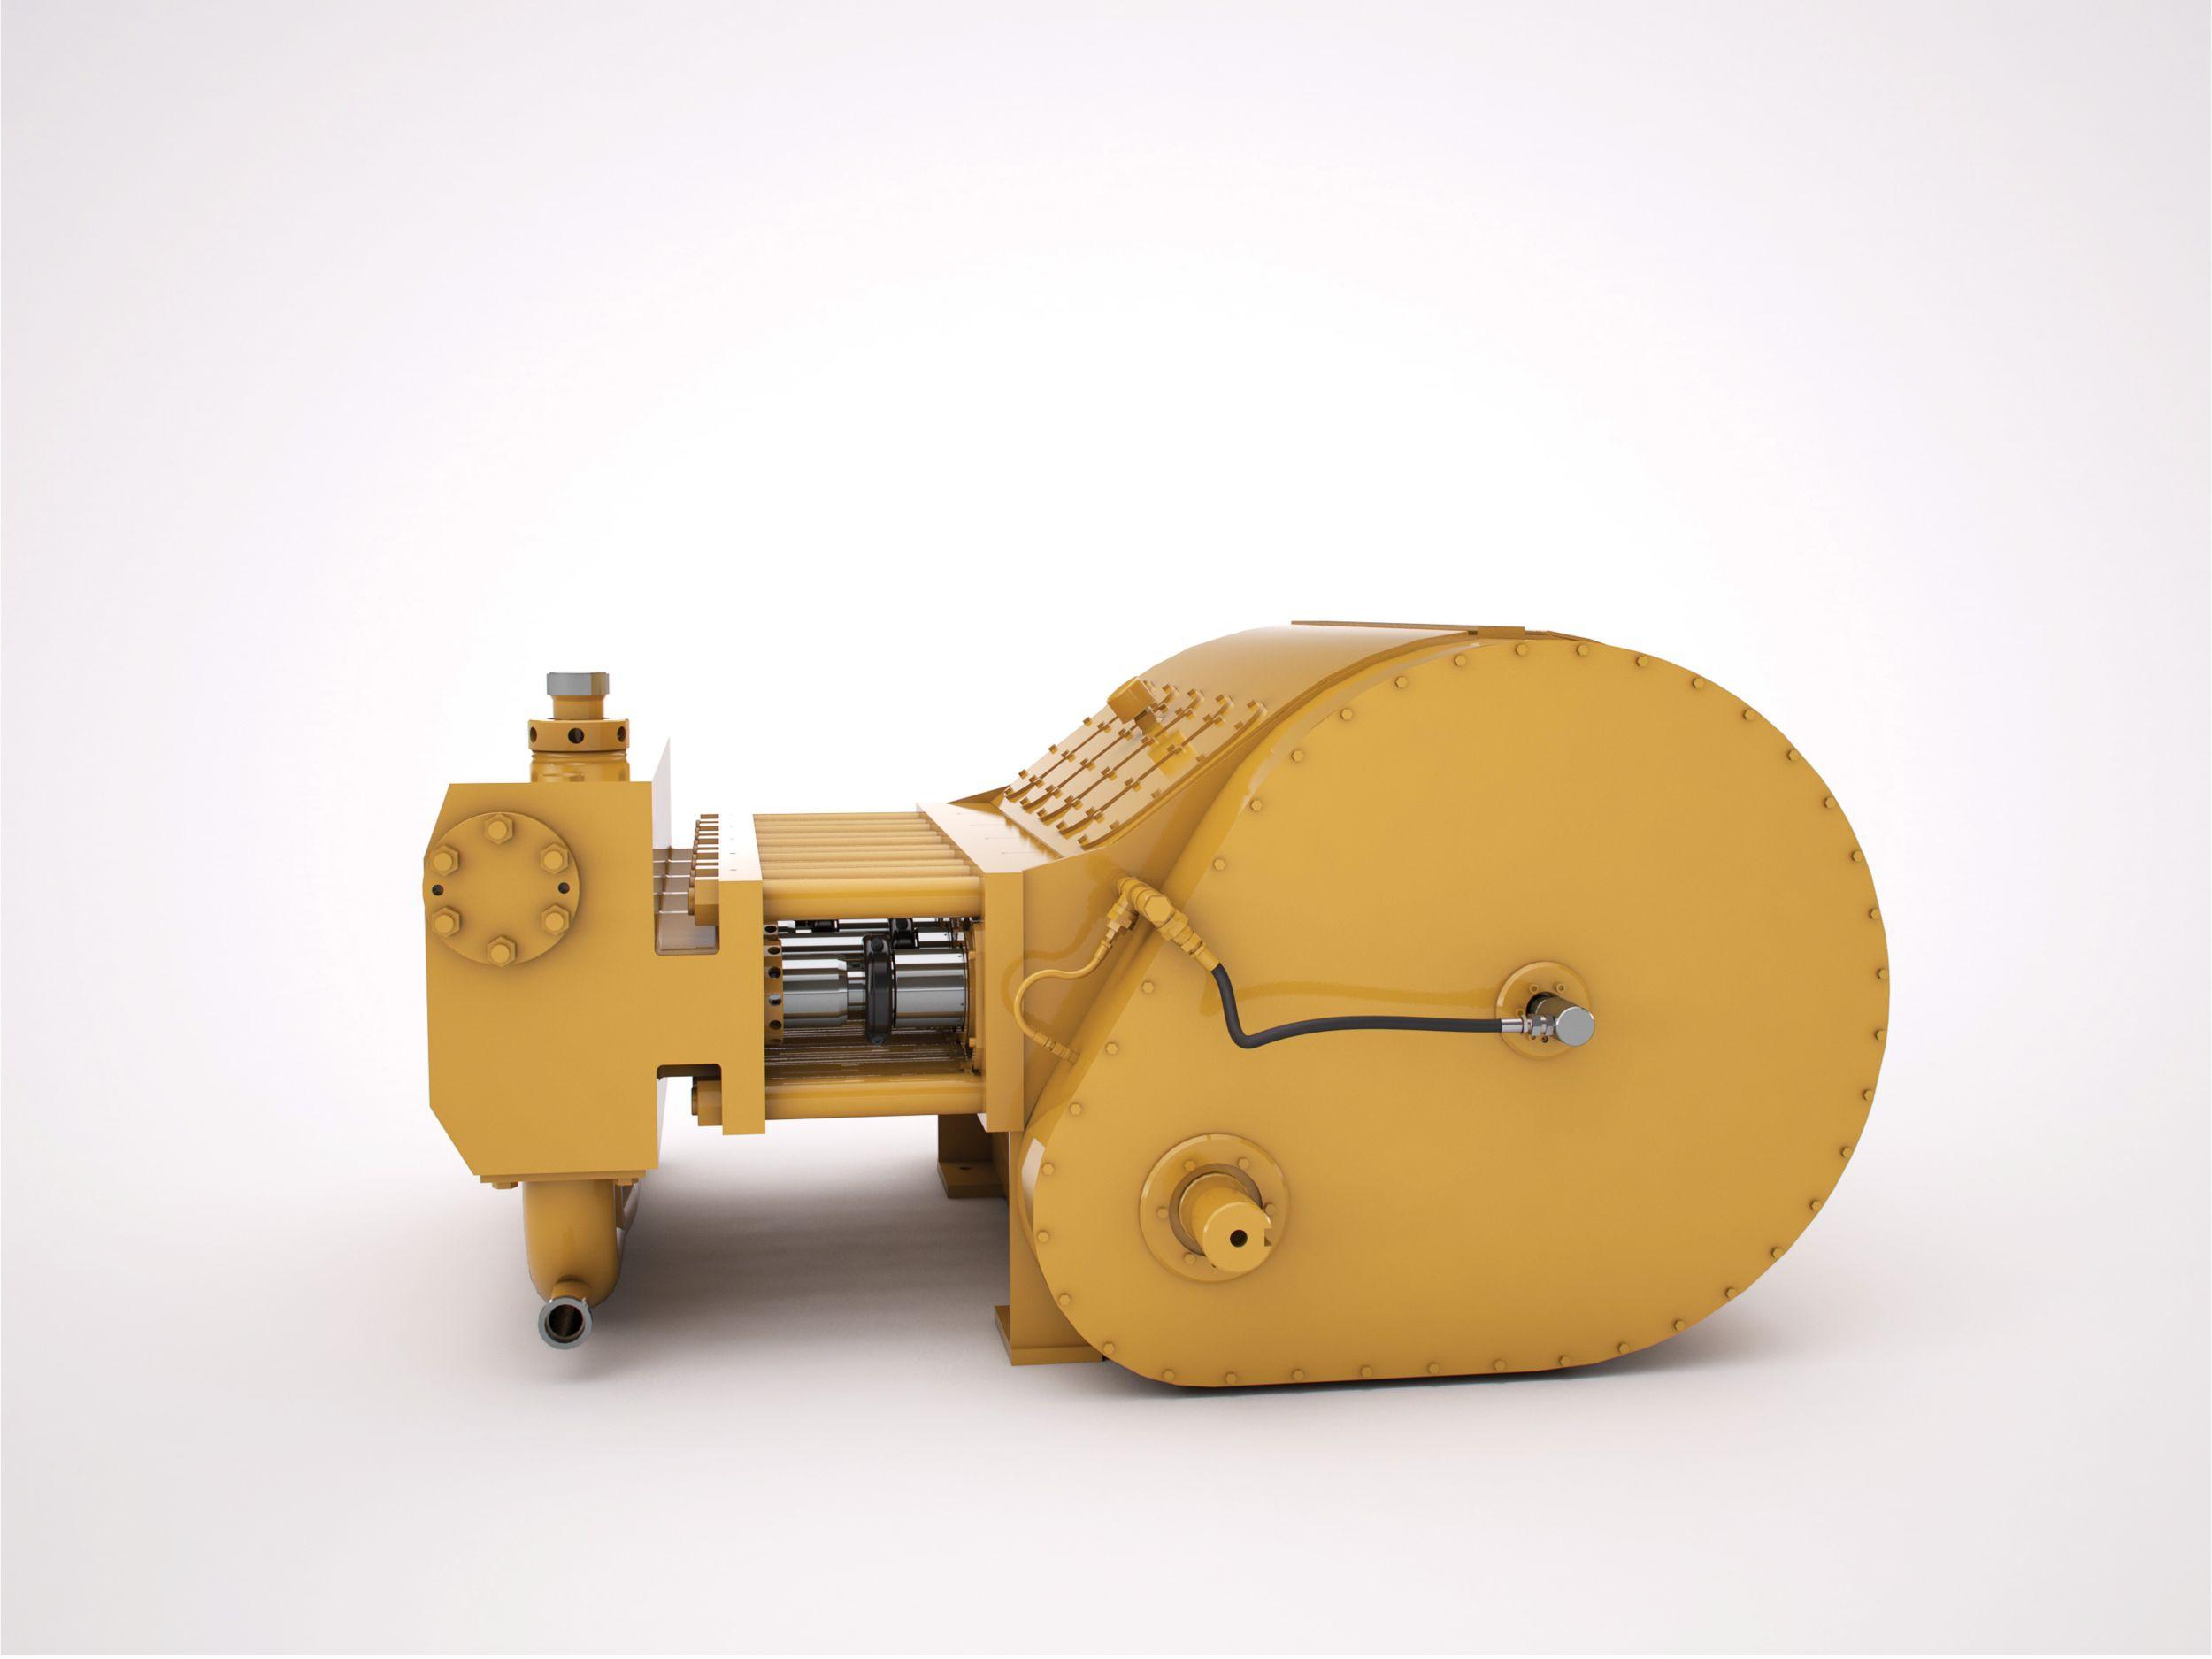 WS255 Quintuplex Well Stimulation Pump